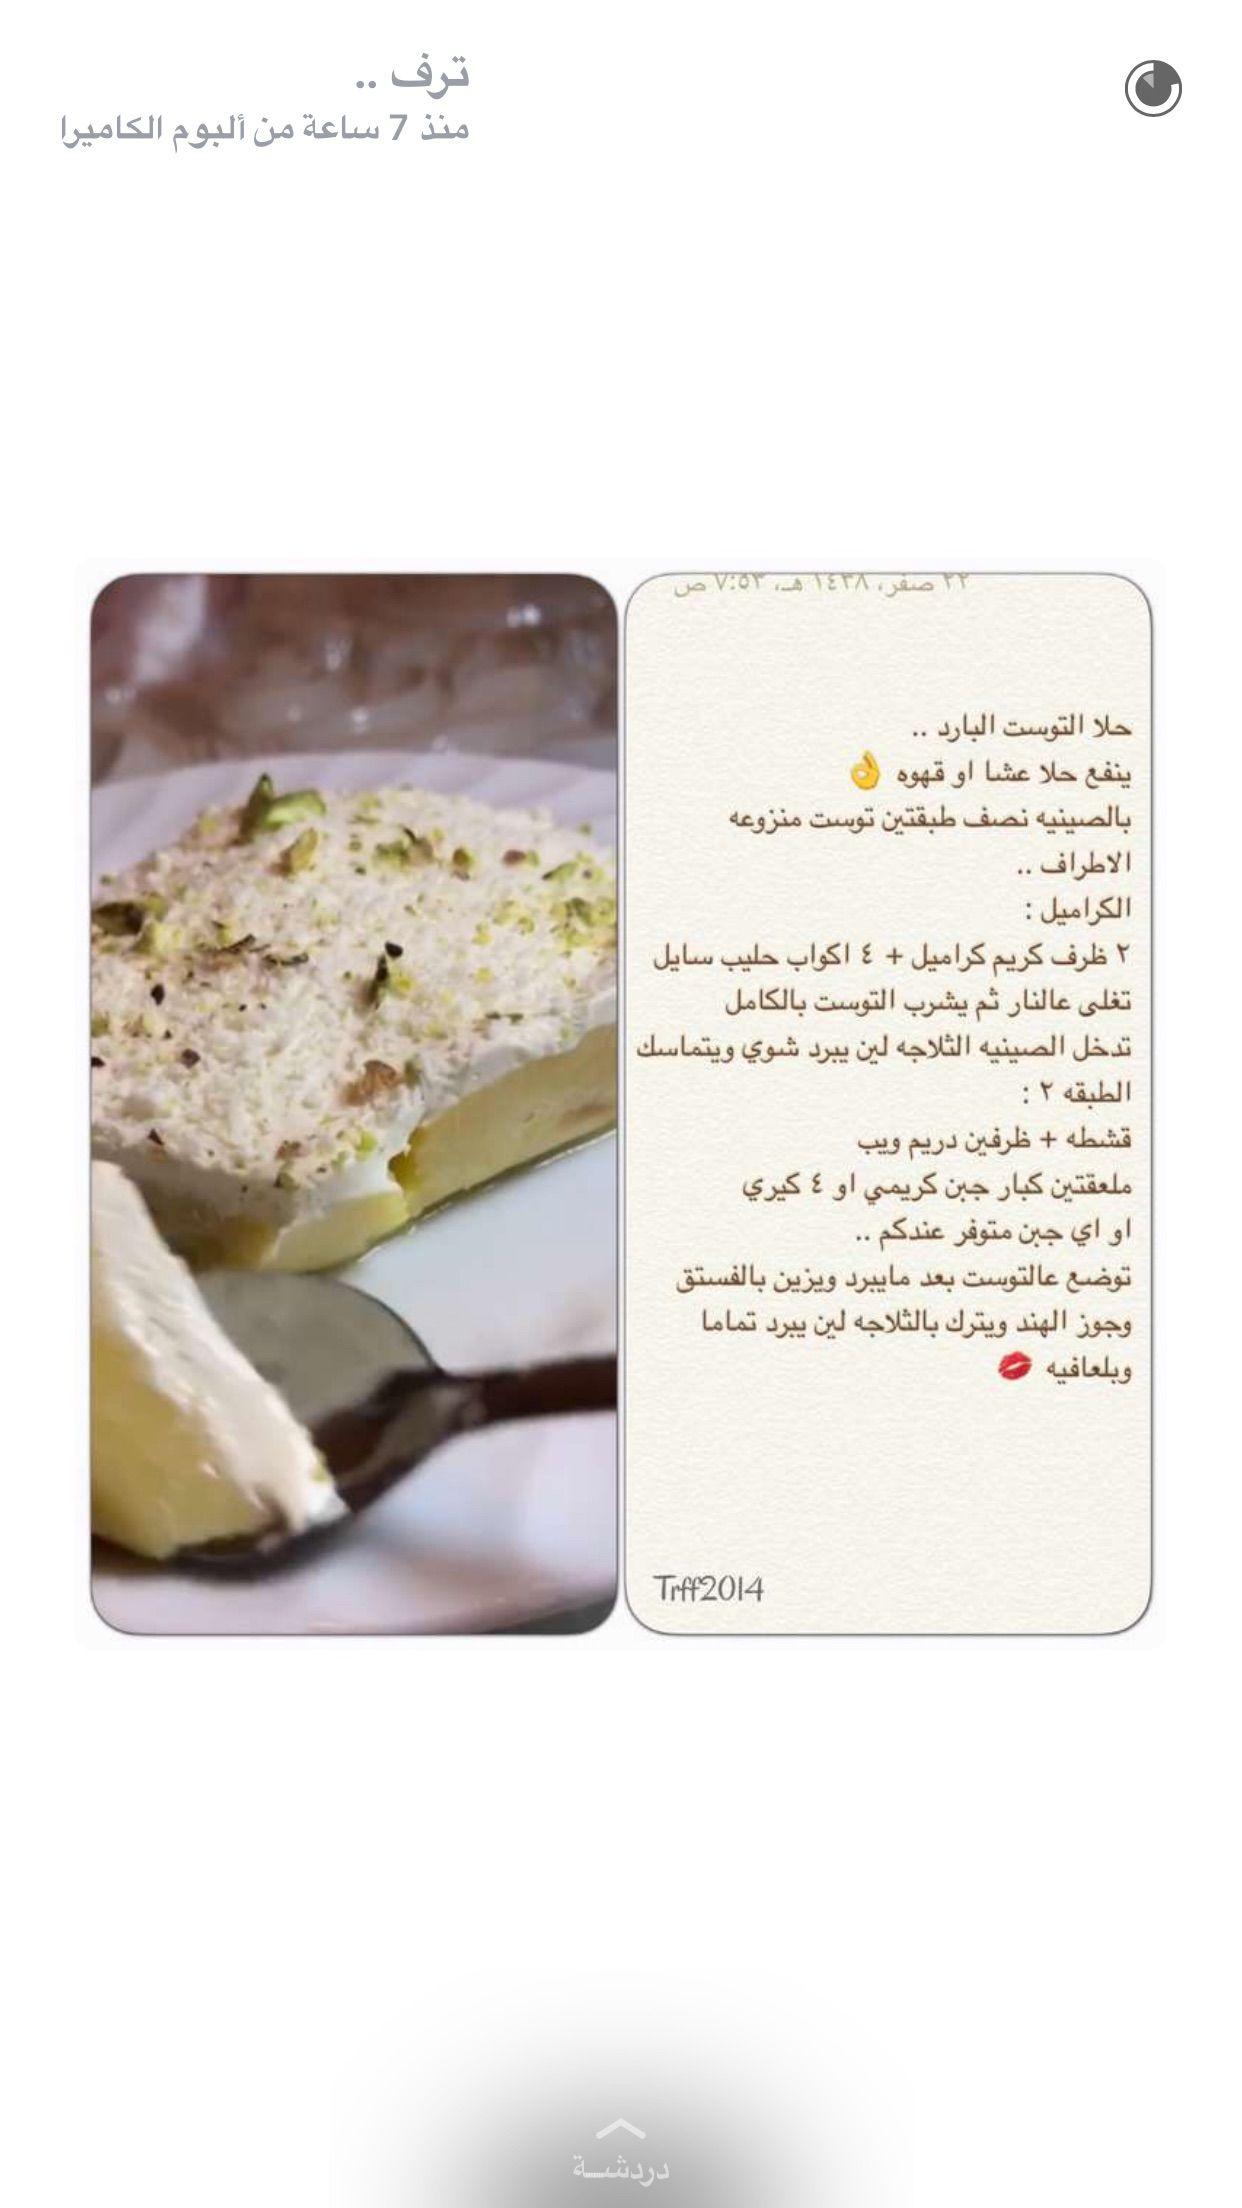 Pin By Batta On طبخات Cooks Food Desserts Reciepes